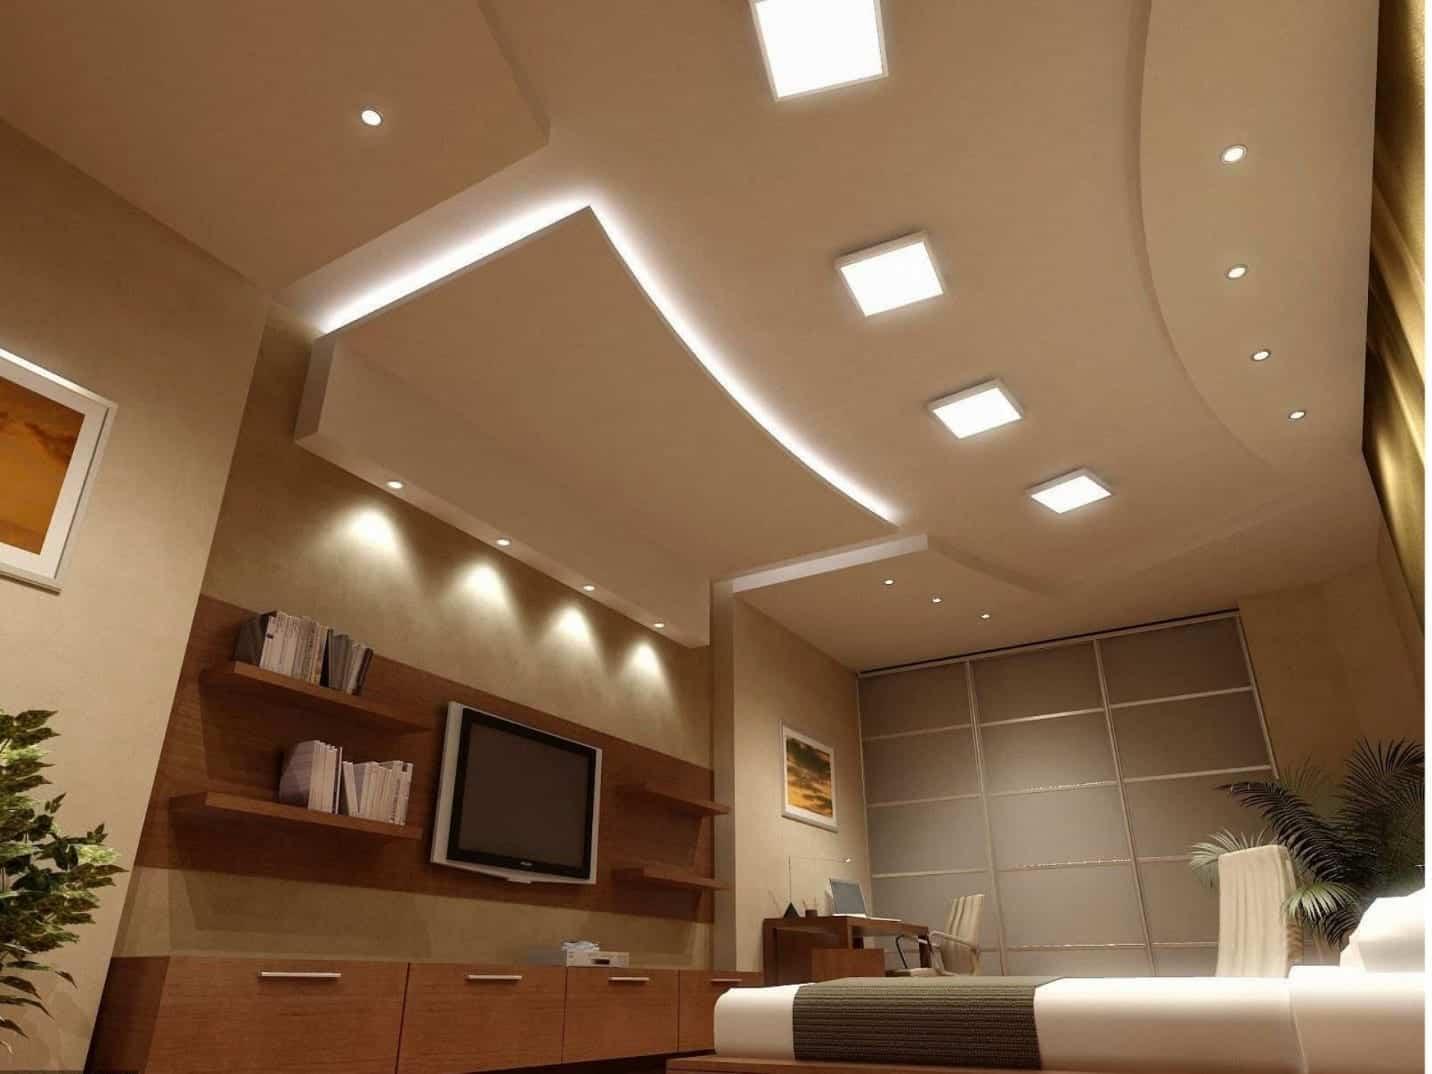 commercial LED lighting upgrade in Spokane, WA